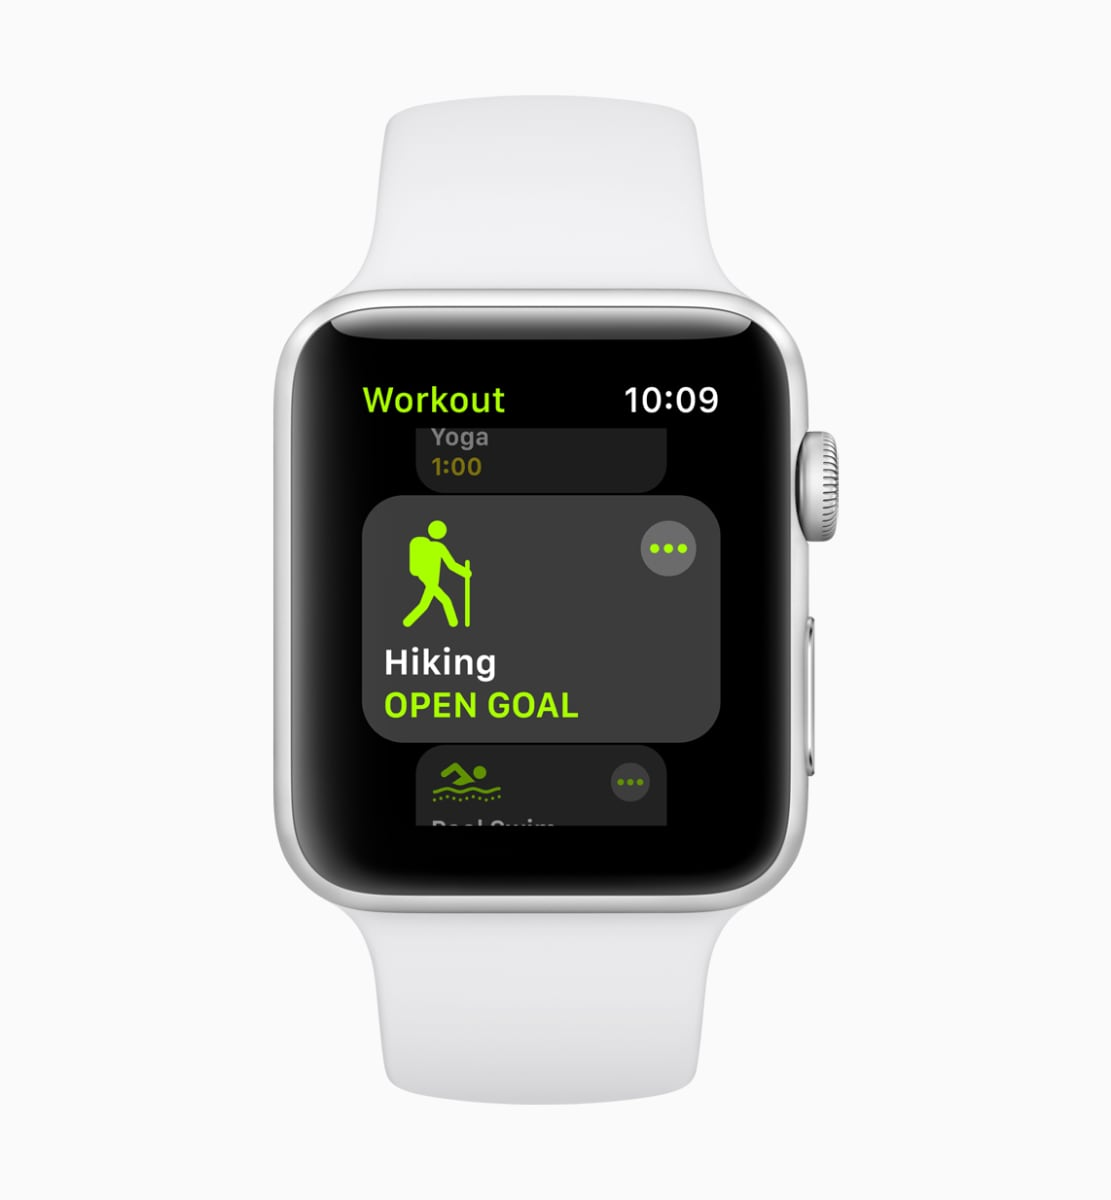 Apple Watch watchOS 5 Hiking Activity Workout